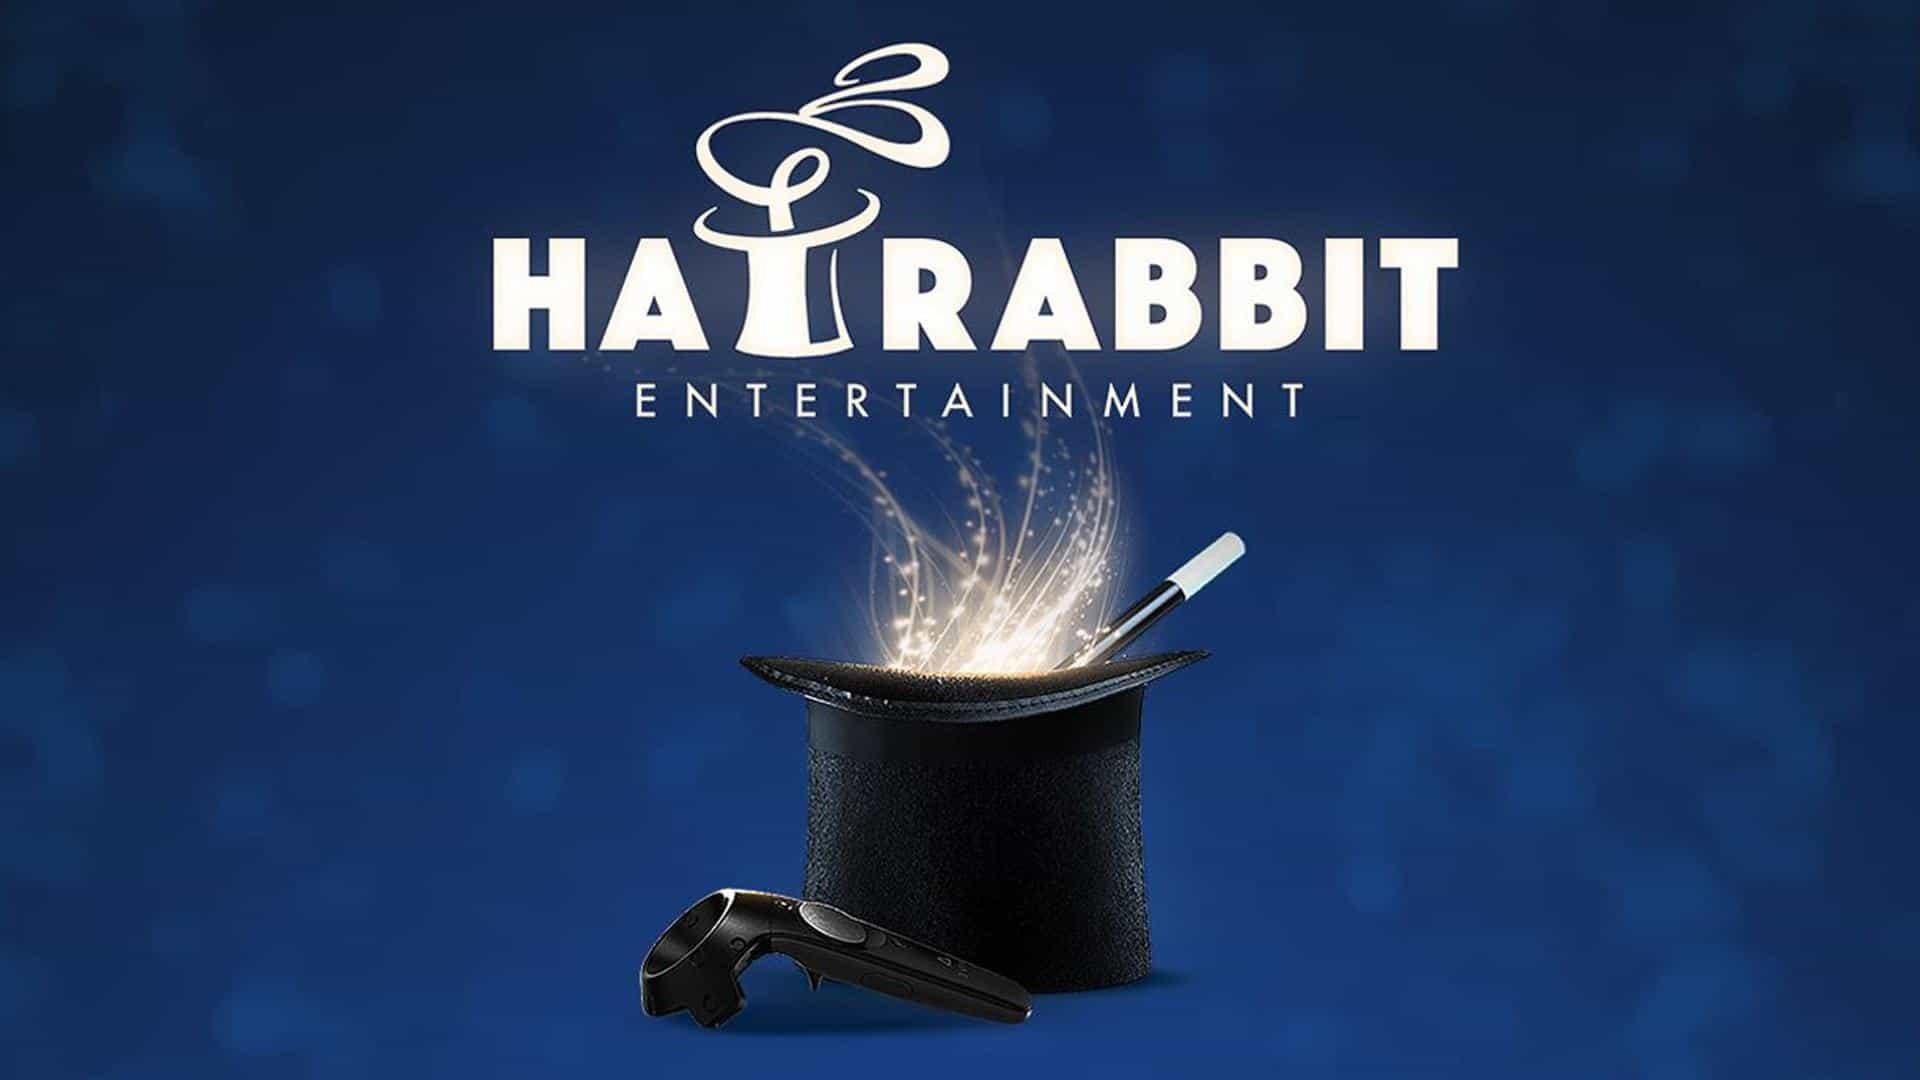 Hatrabbit Entertainment